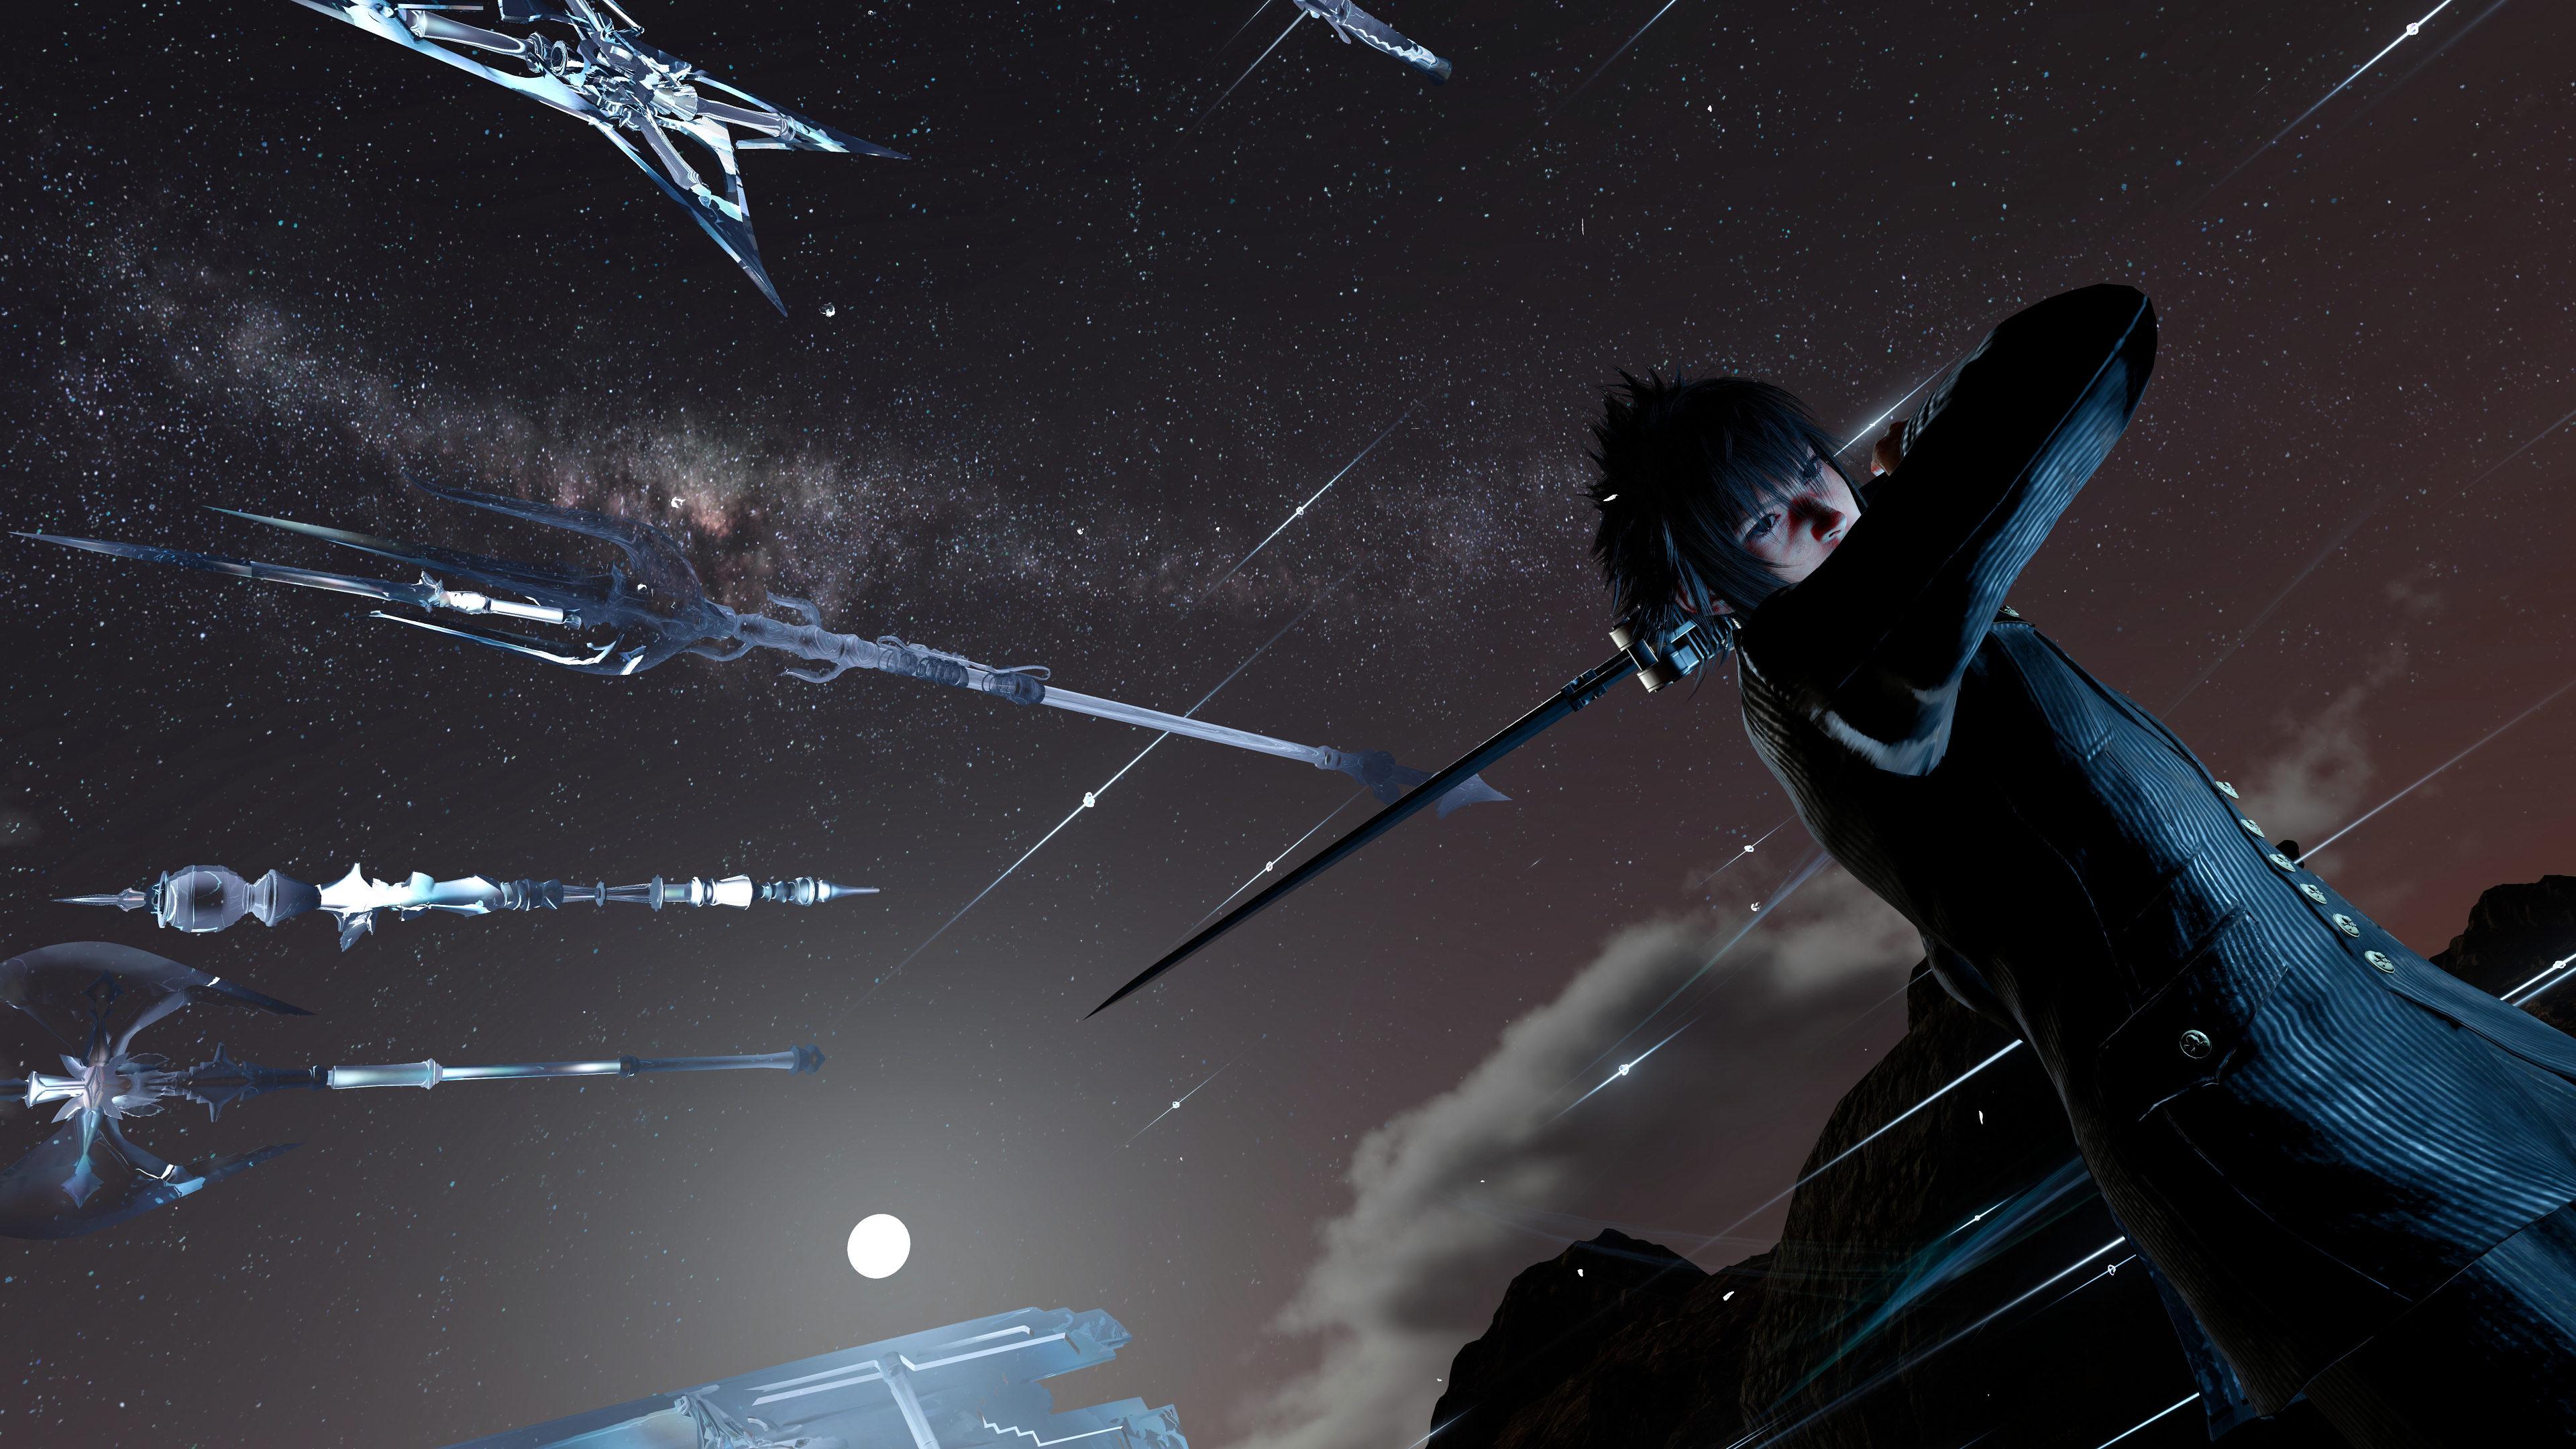 Portrait Final Fantasy Xv